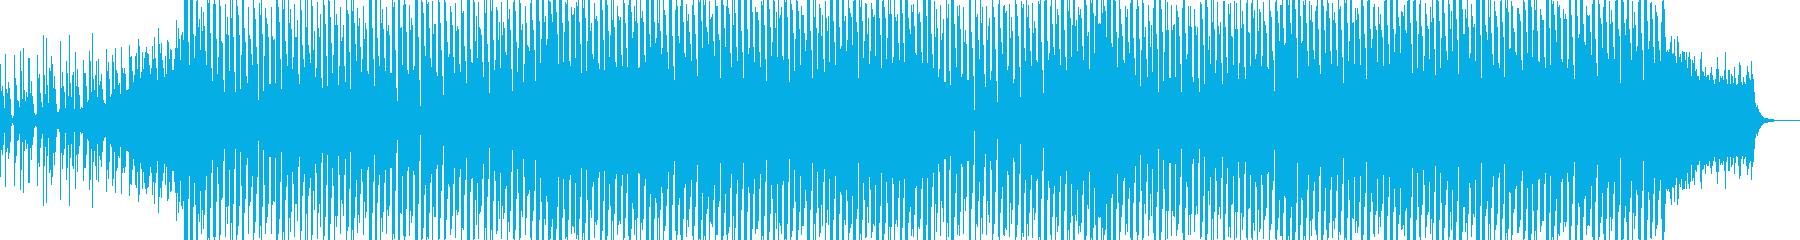 EDMポップで明るいクラブ系-115の再生済みの波形